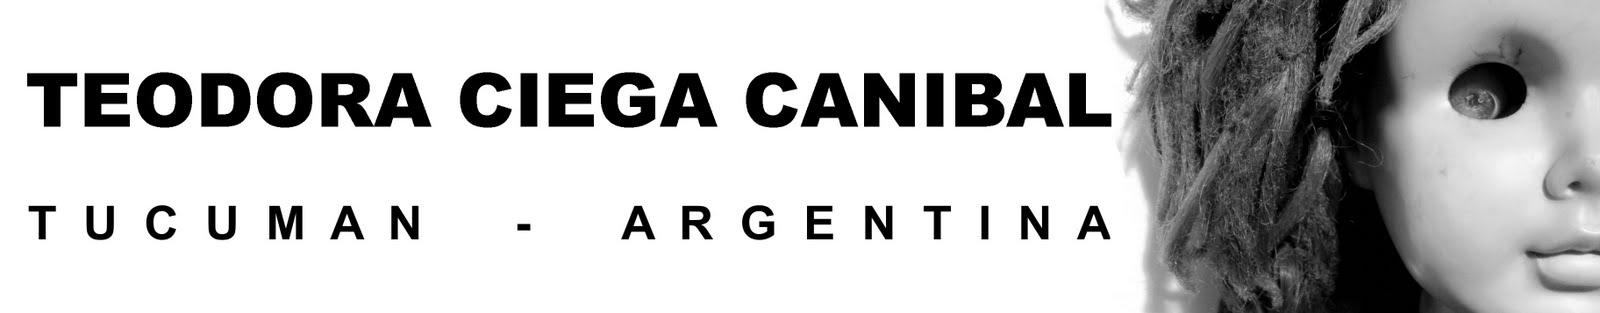 TEODORA CIEGA CANIBAL - TUCUMAN - ARGENTINA